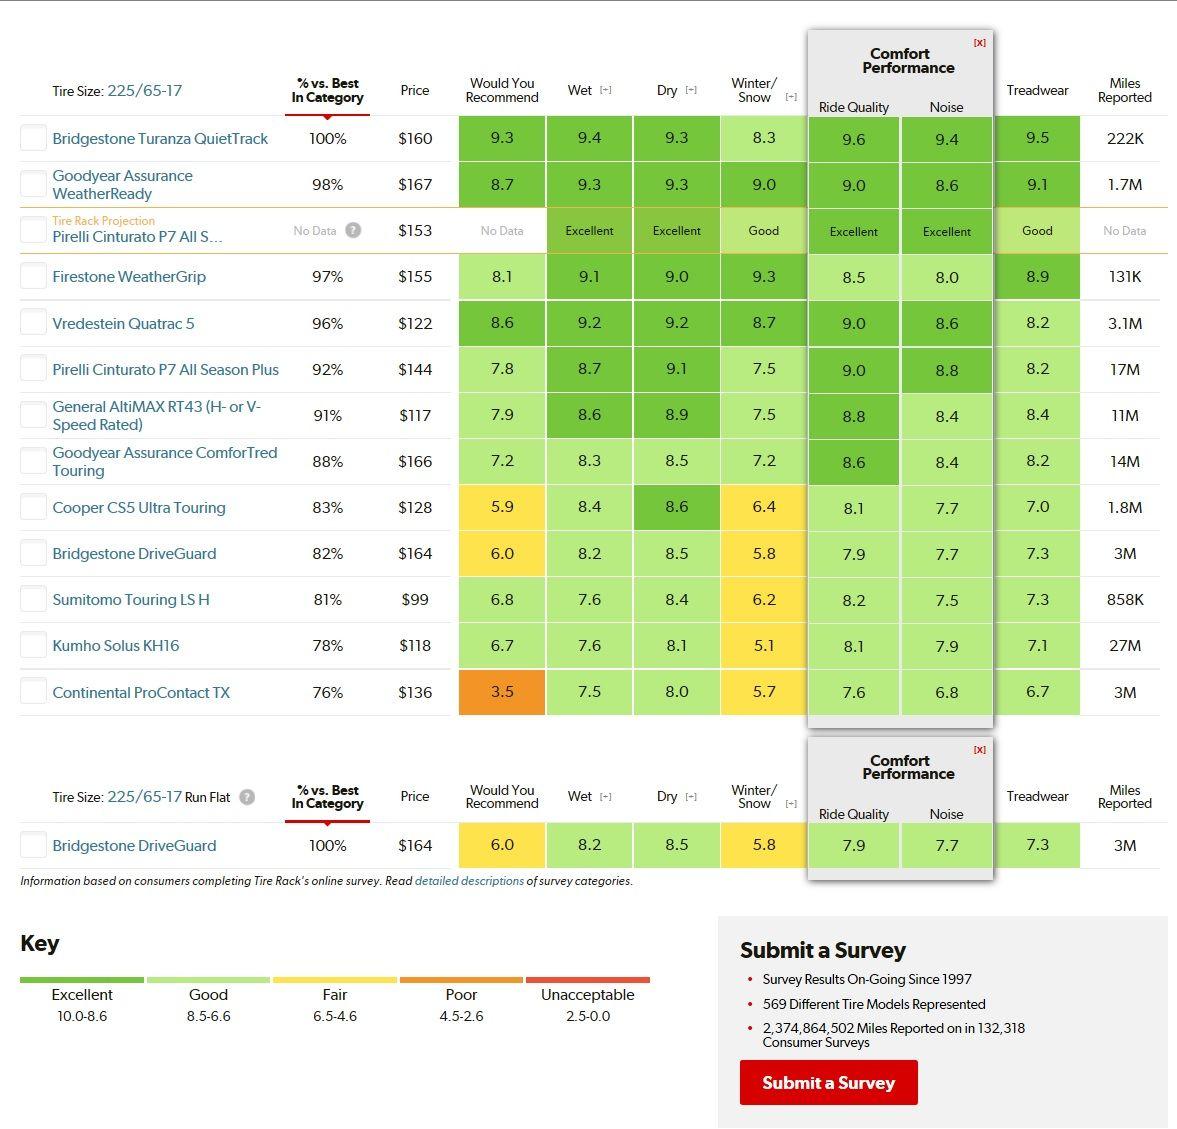 Tire Ratings Charts_Grand Touring All-Season 225-65R17_02.jpg